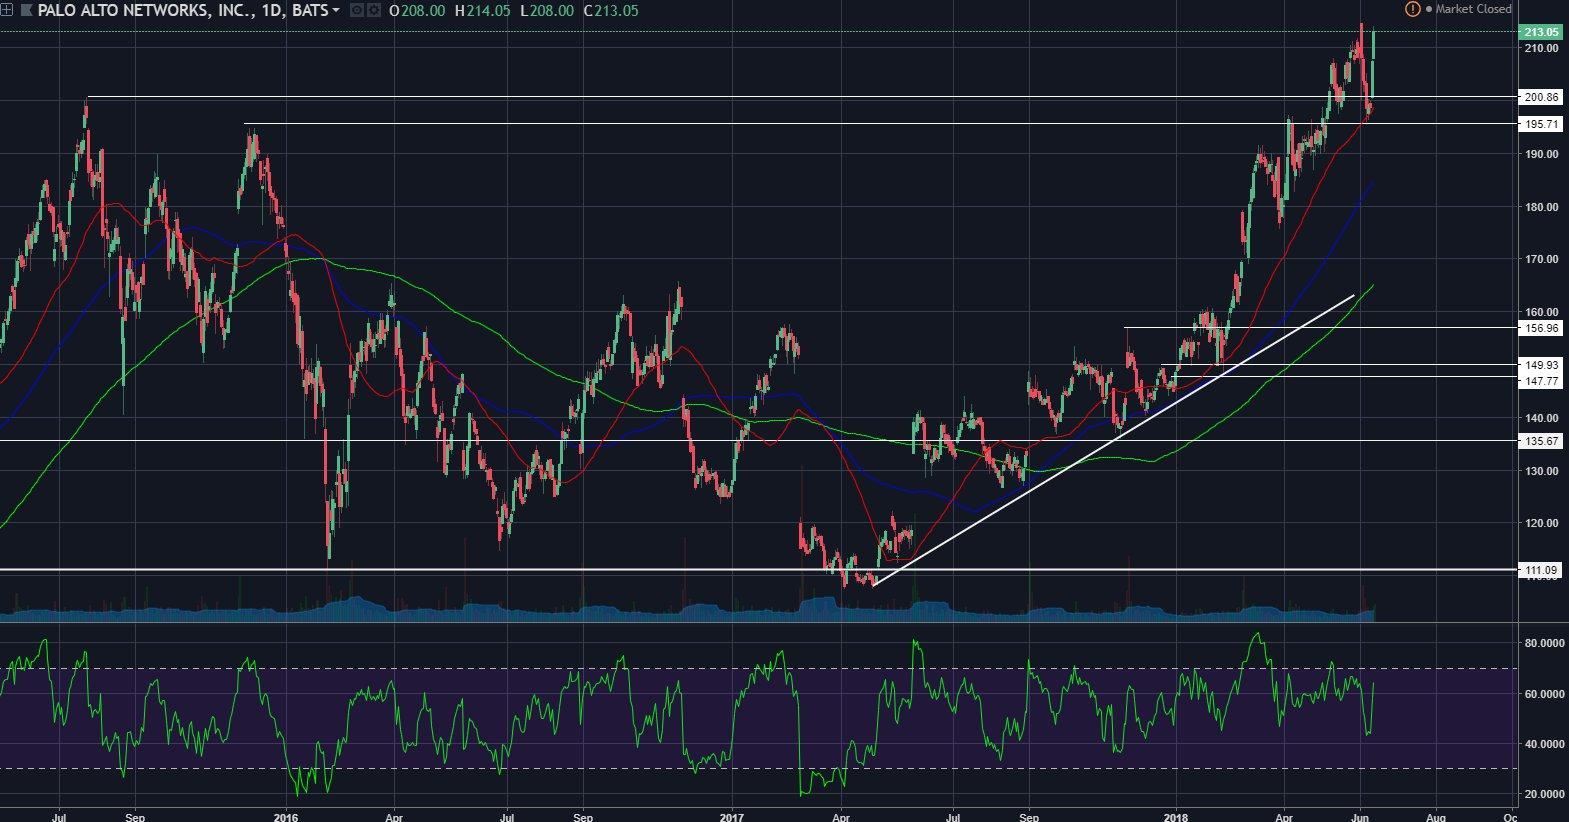 Panw Palo Alto Networks Inc Panw Stock Price Trade Ideas